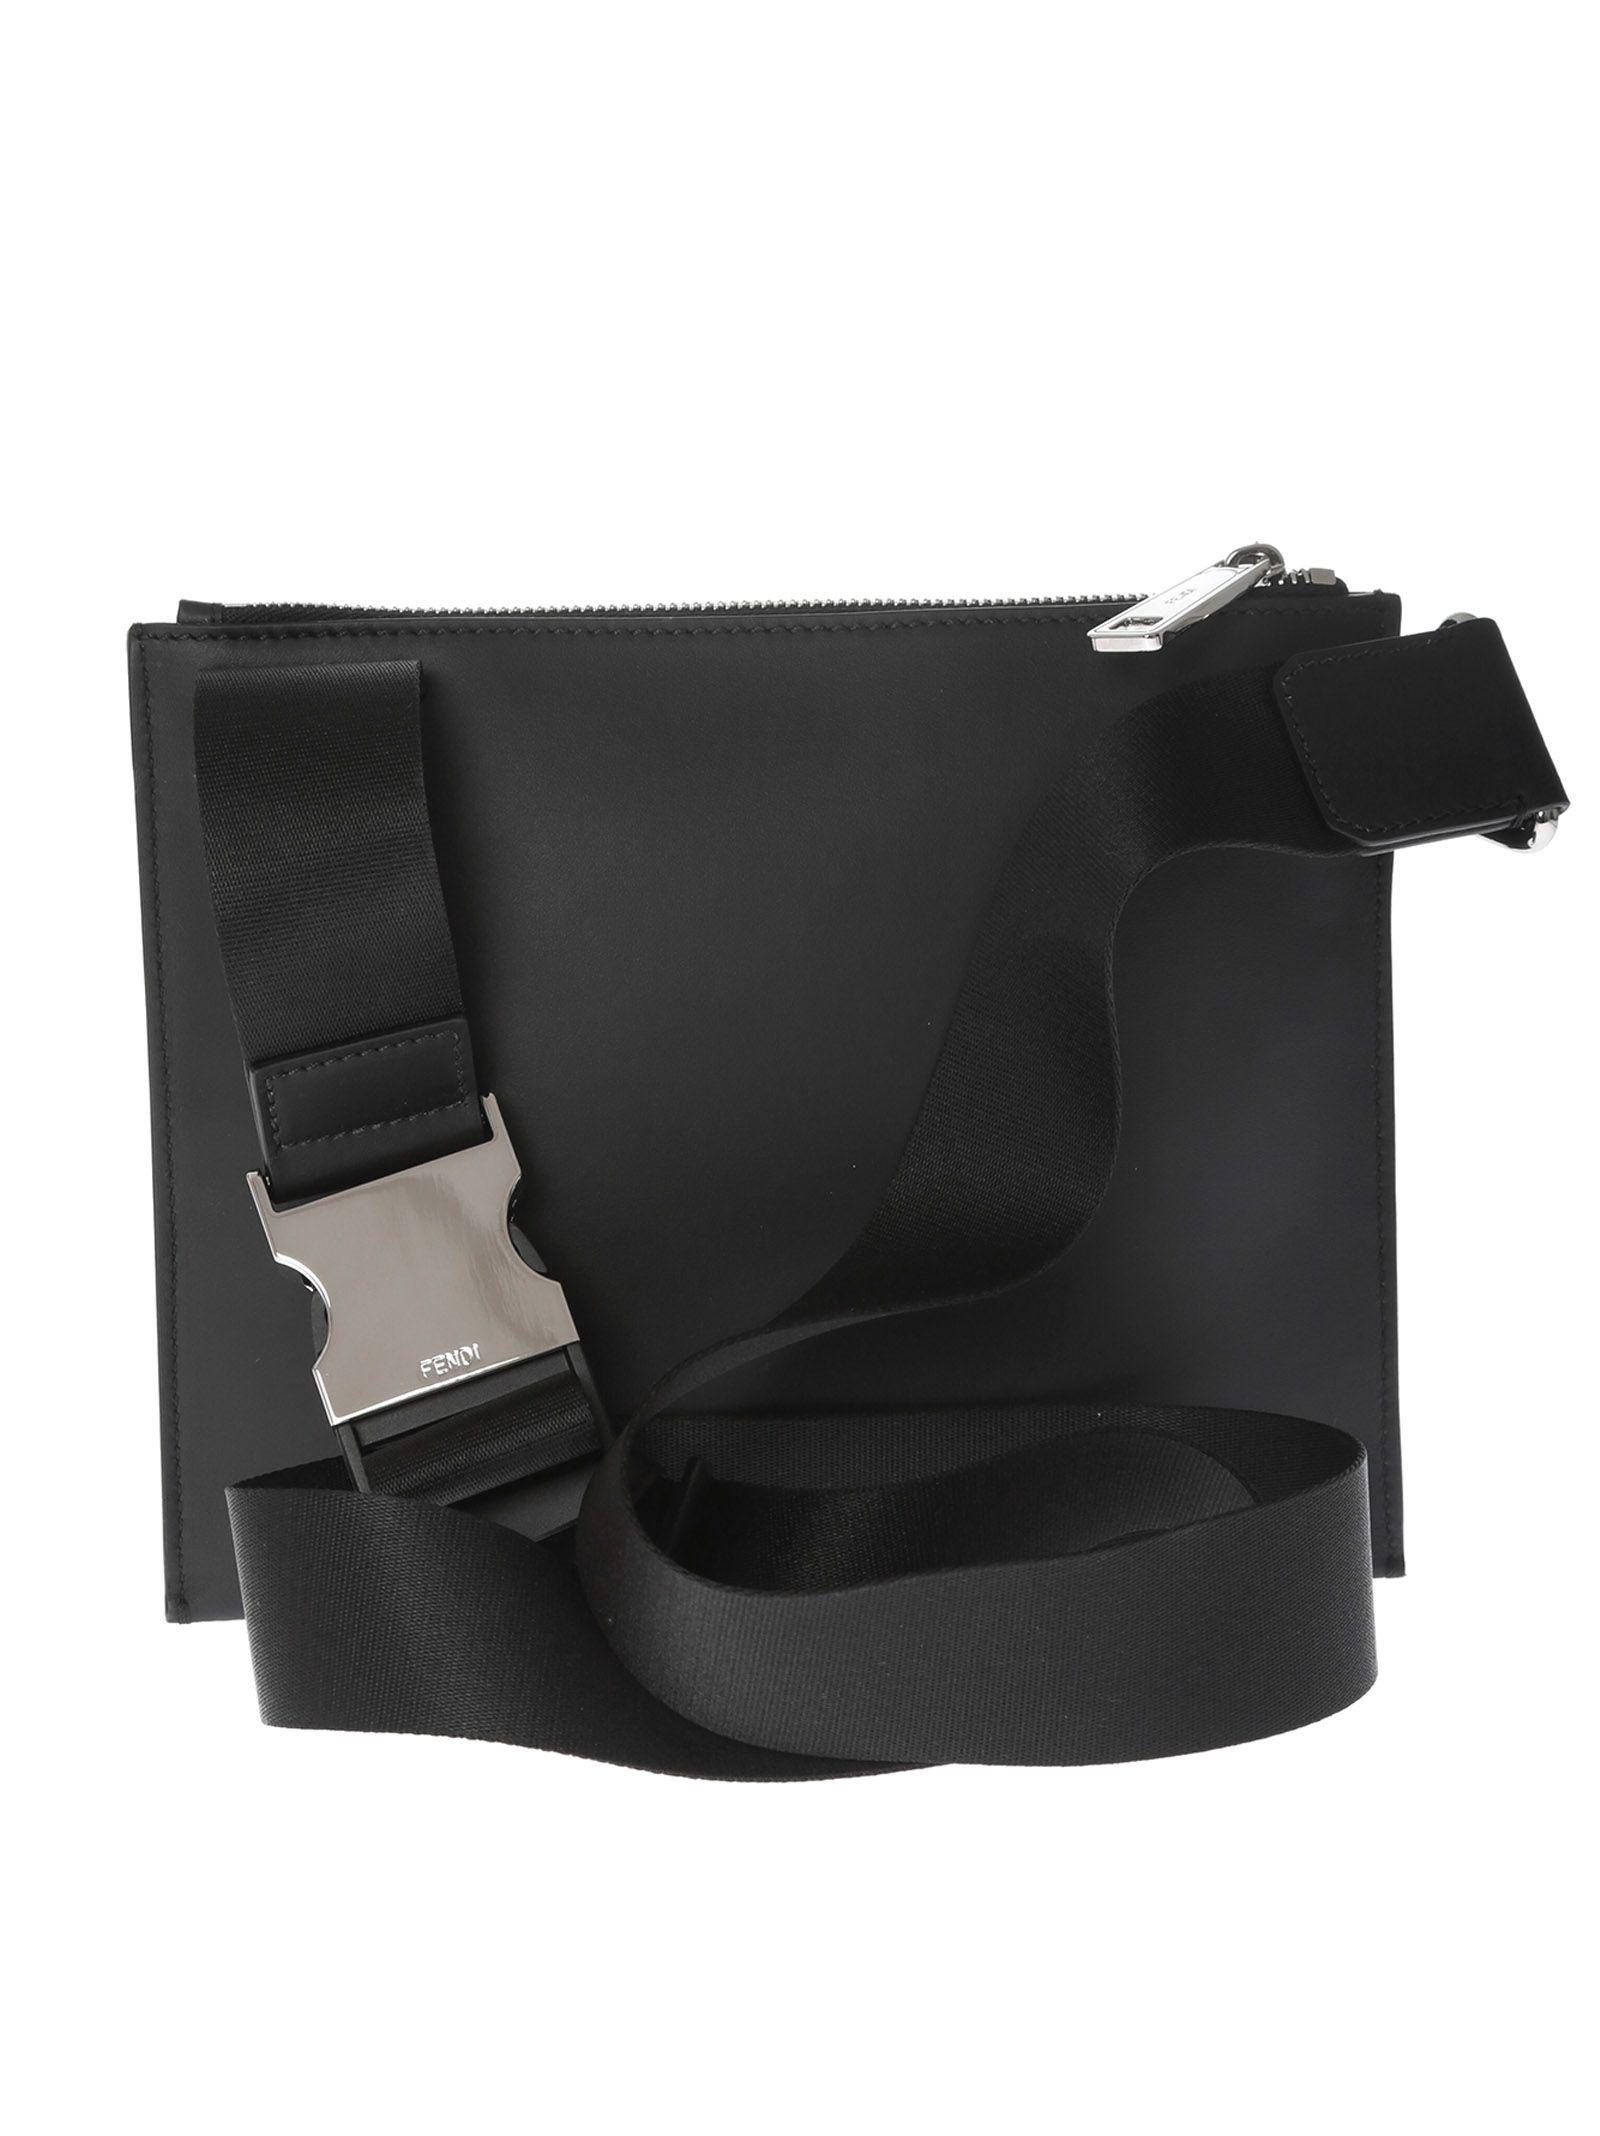 6cb952c14b59 Fendi Logo Monogram Shoulder Bag Fendi Logo Monogram Shoulder Bag ...